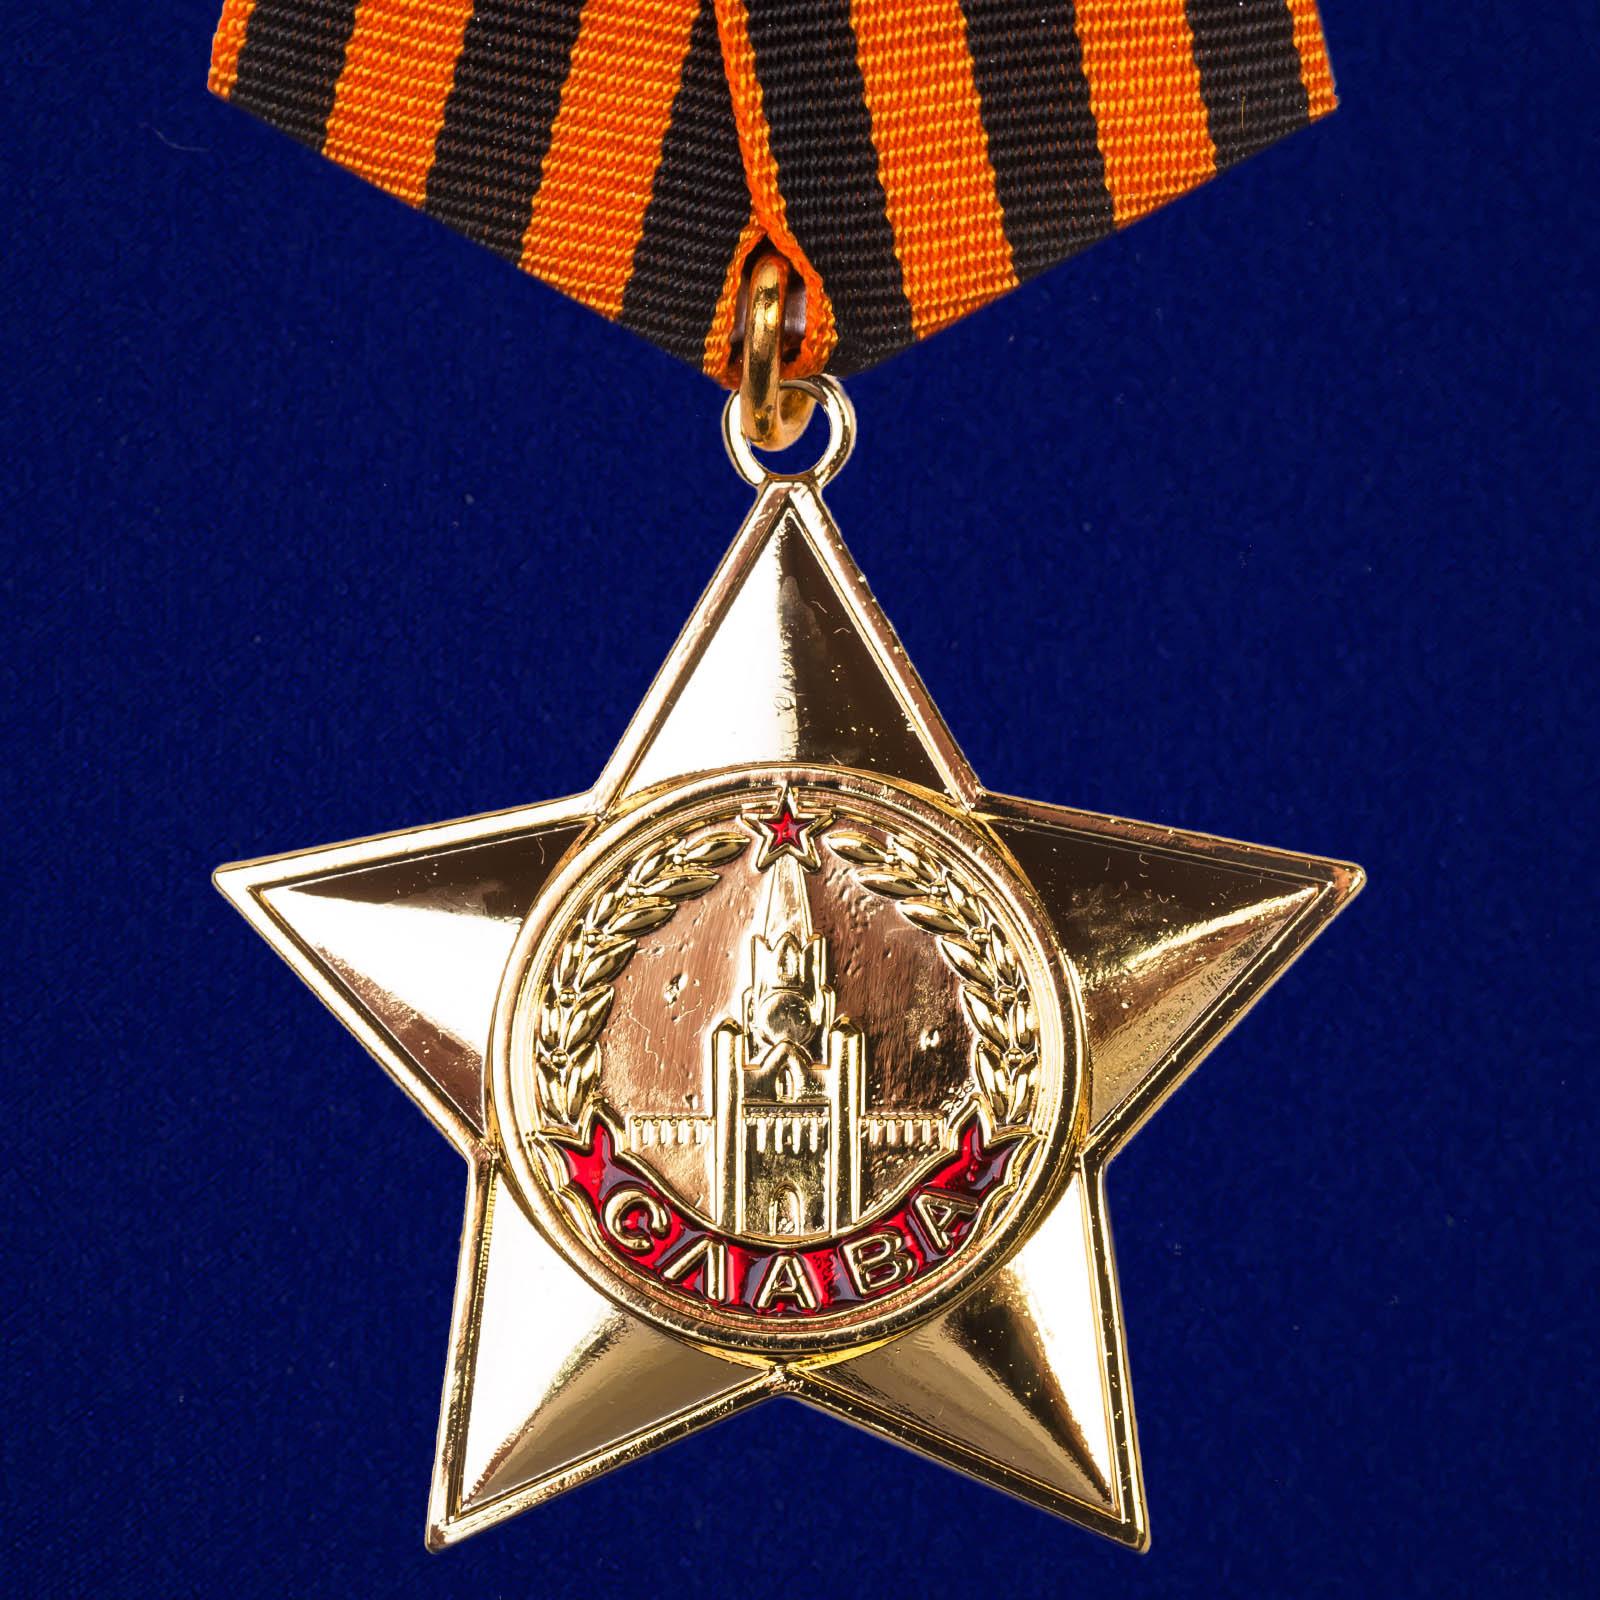 Орден Славы 1-й степени